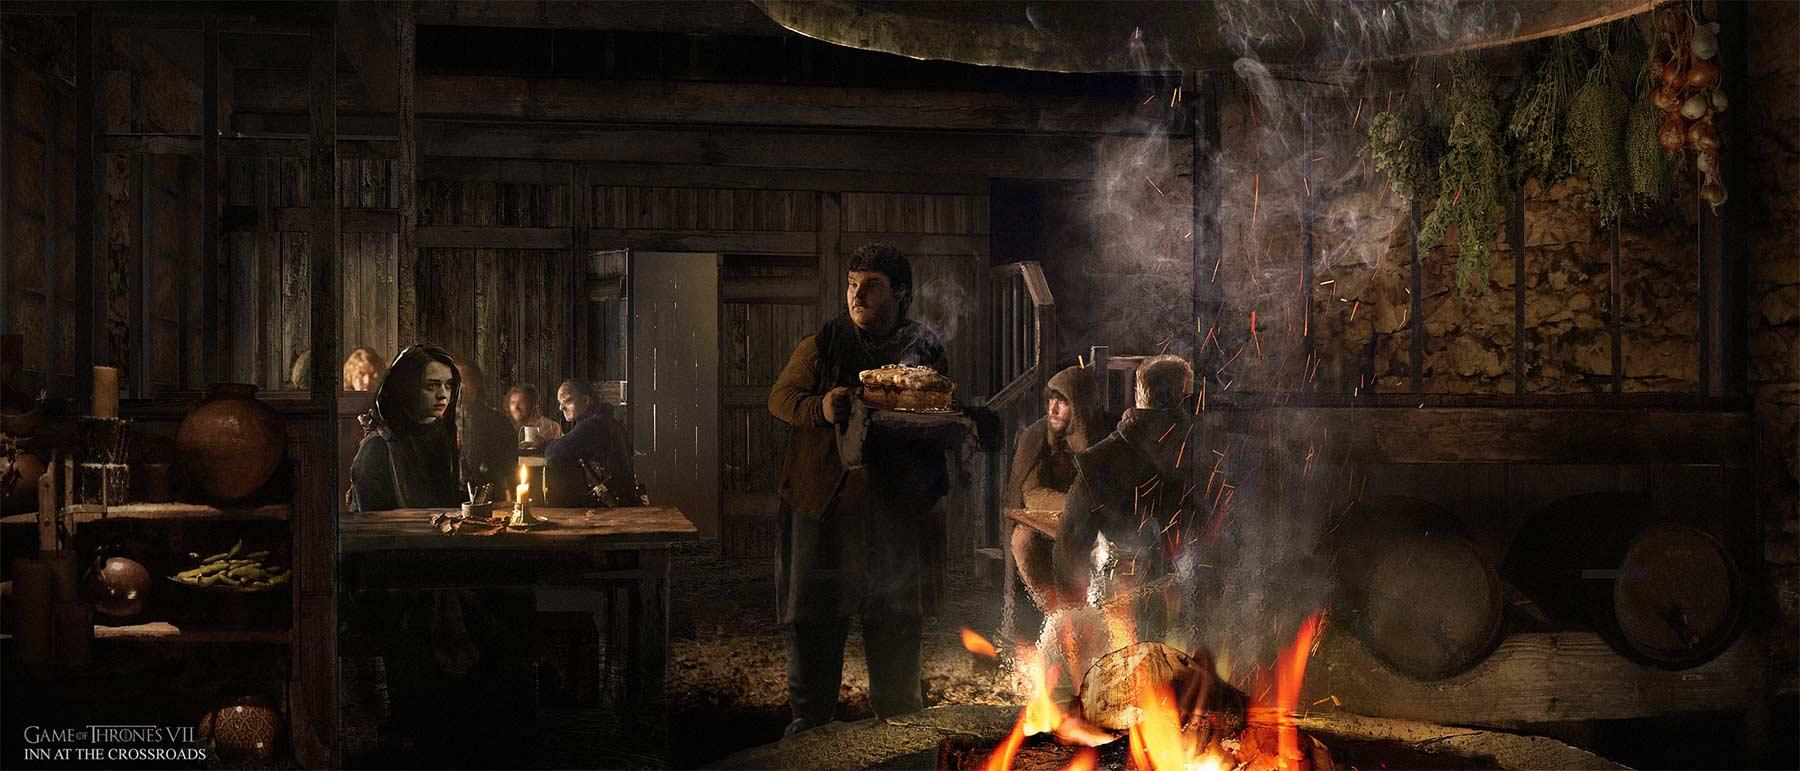 Game of Thrones Staffel 7 Concept Art Kieran-Belshaw-game-of-thrones-concept-art_12